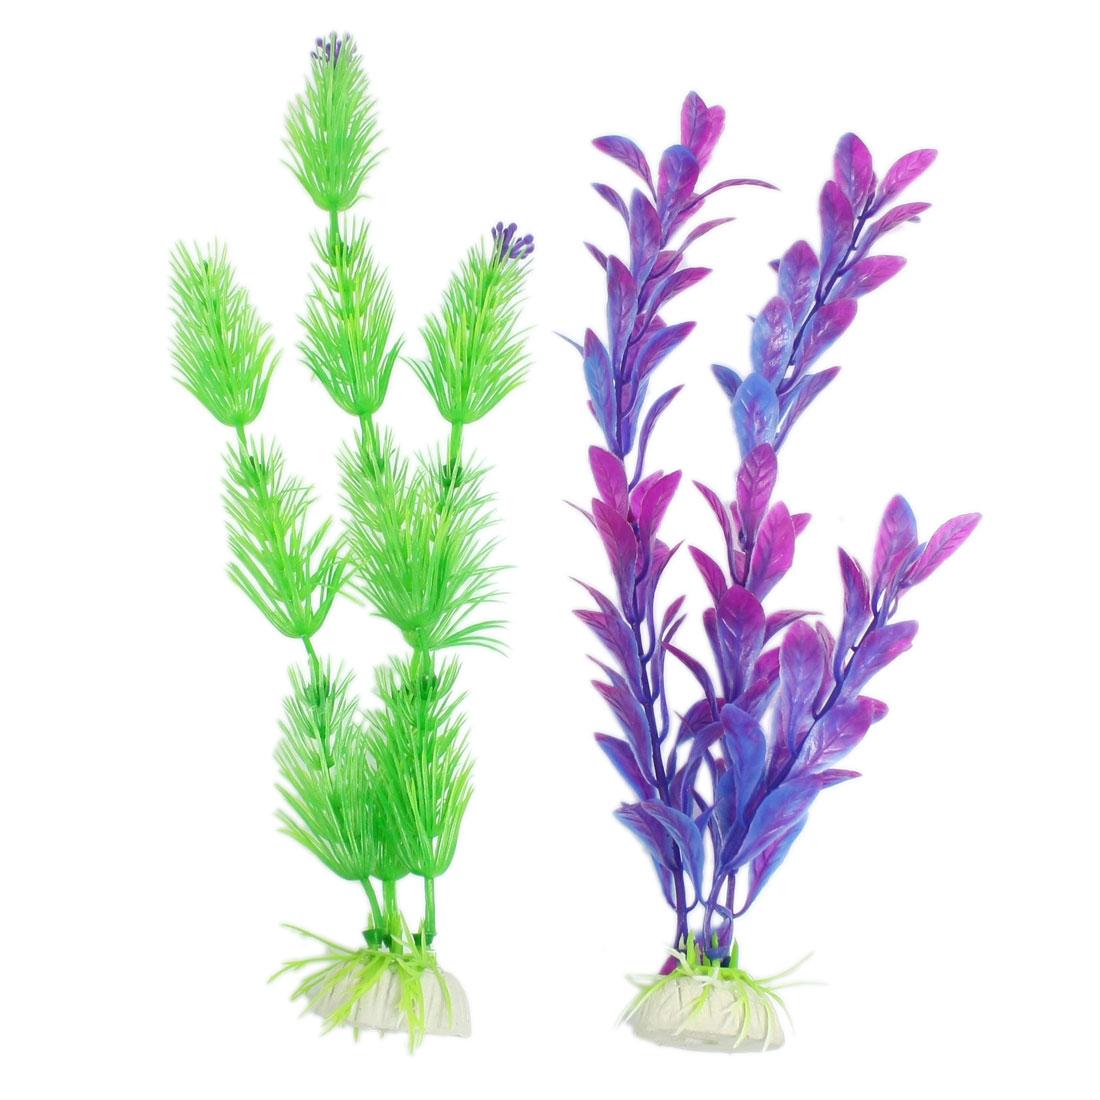 2 Pcs Green Blue Purple Plastic Plants Aquarium Fish Tank Ornament